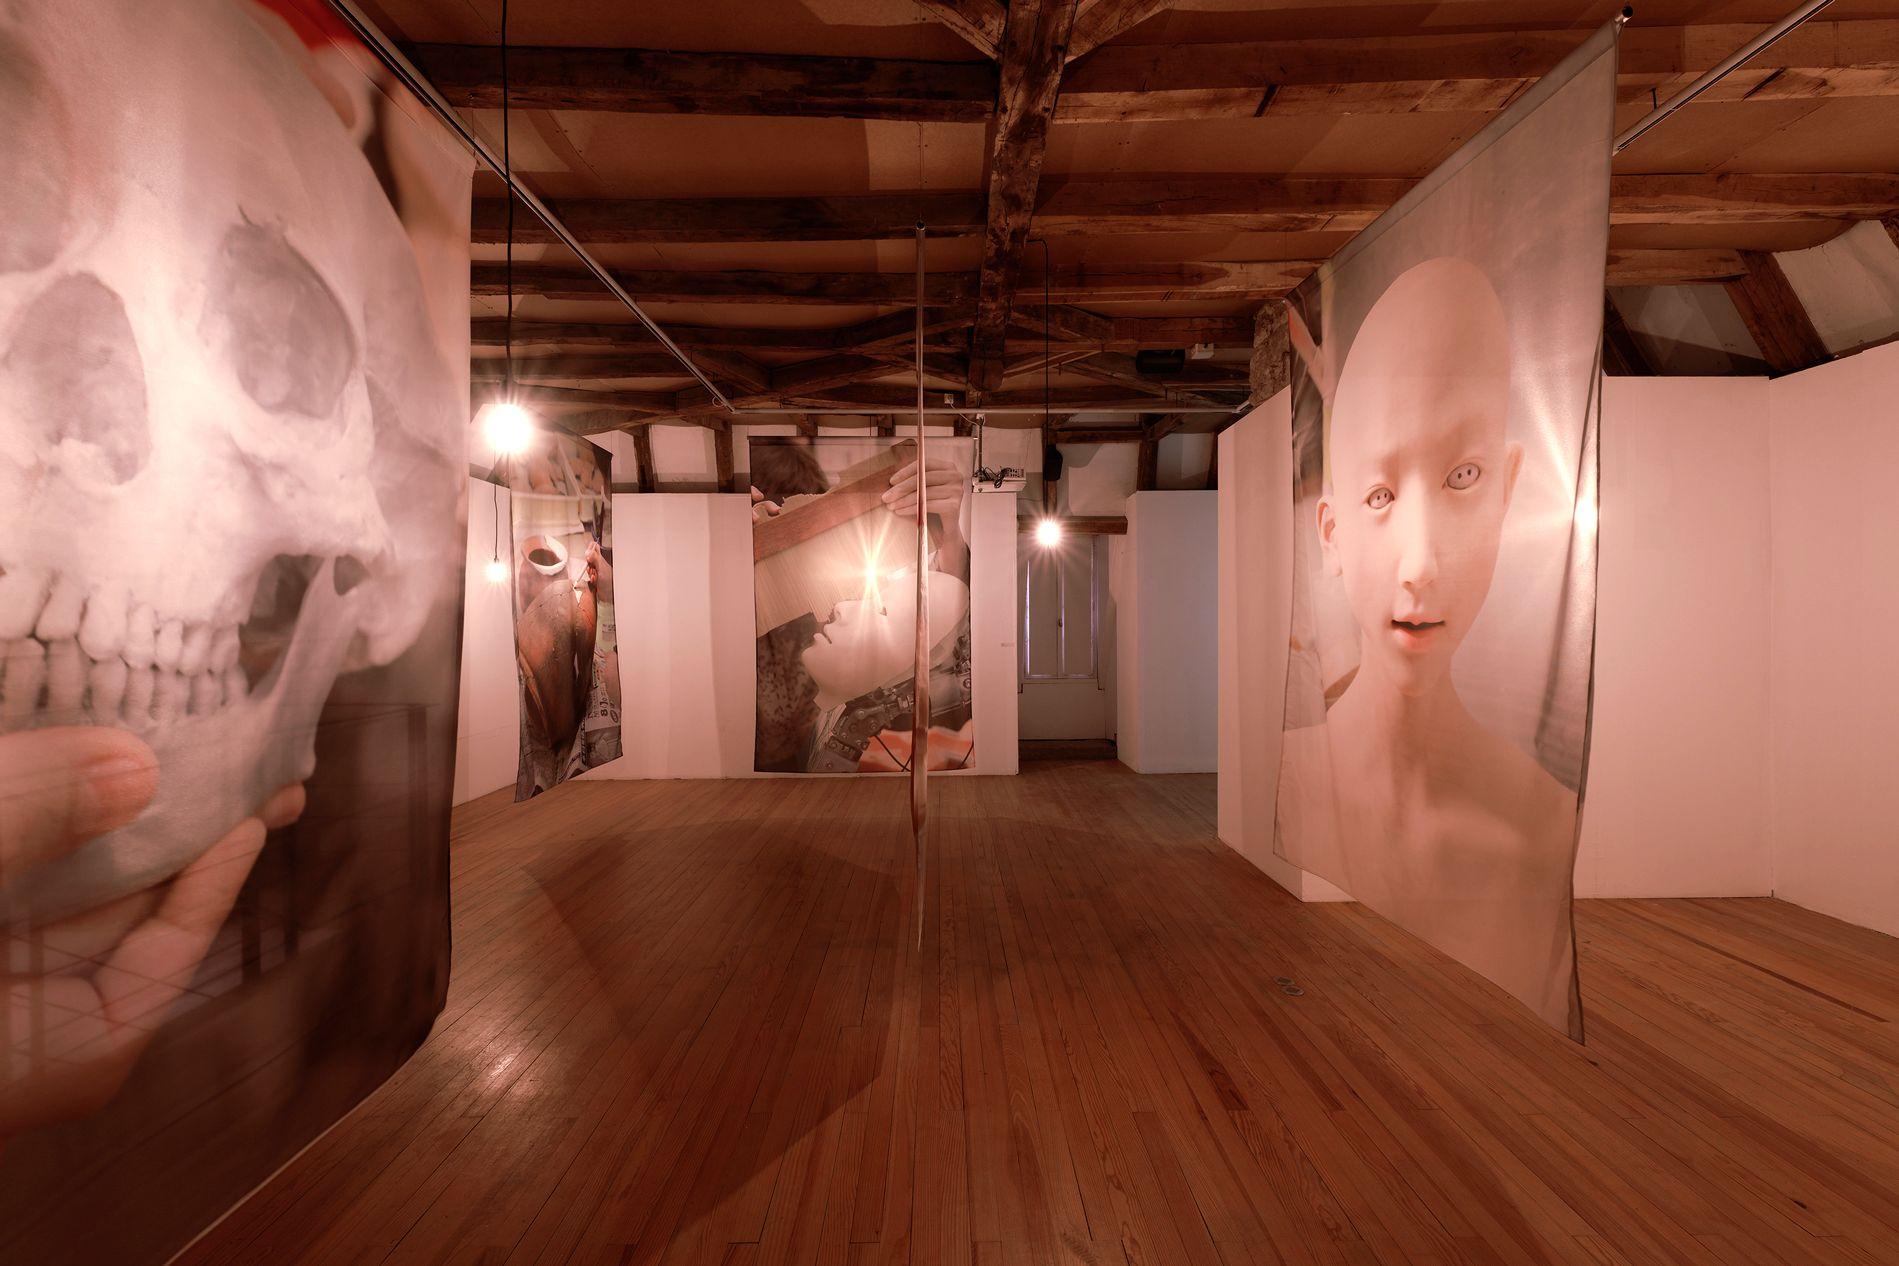 Où est ladifférence ? Centre d'Art Contemporain – Abbaye de Meymac, France